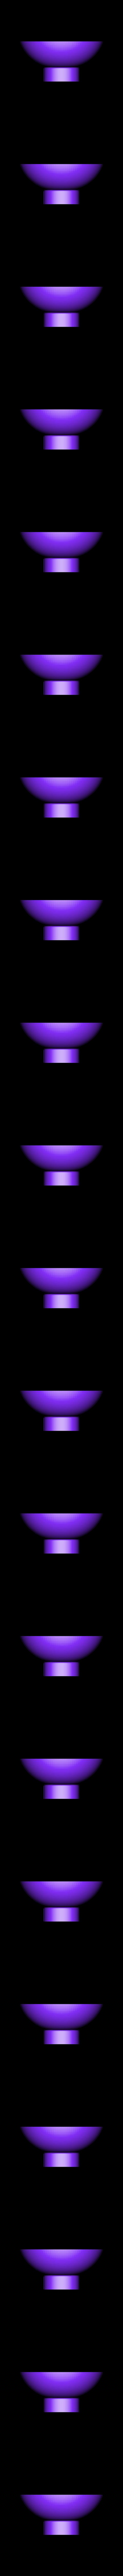 bottle-cap-funnel.stl Download free STL file Bottle Cap Funnel • Template to 3D print, O3D